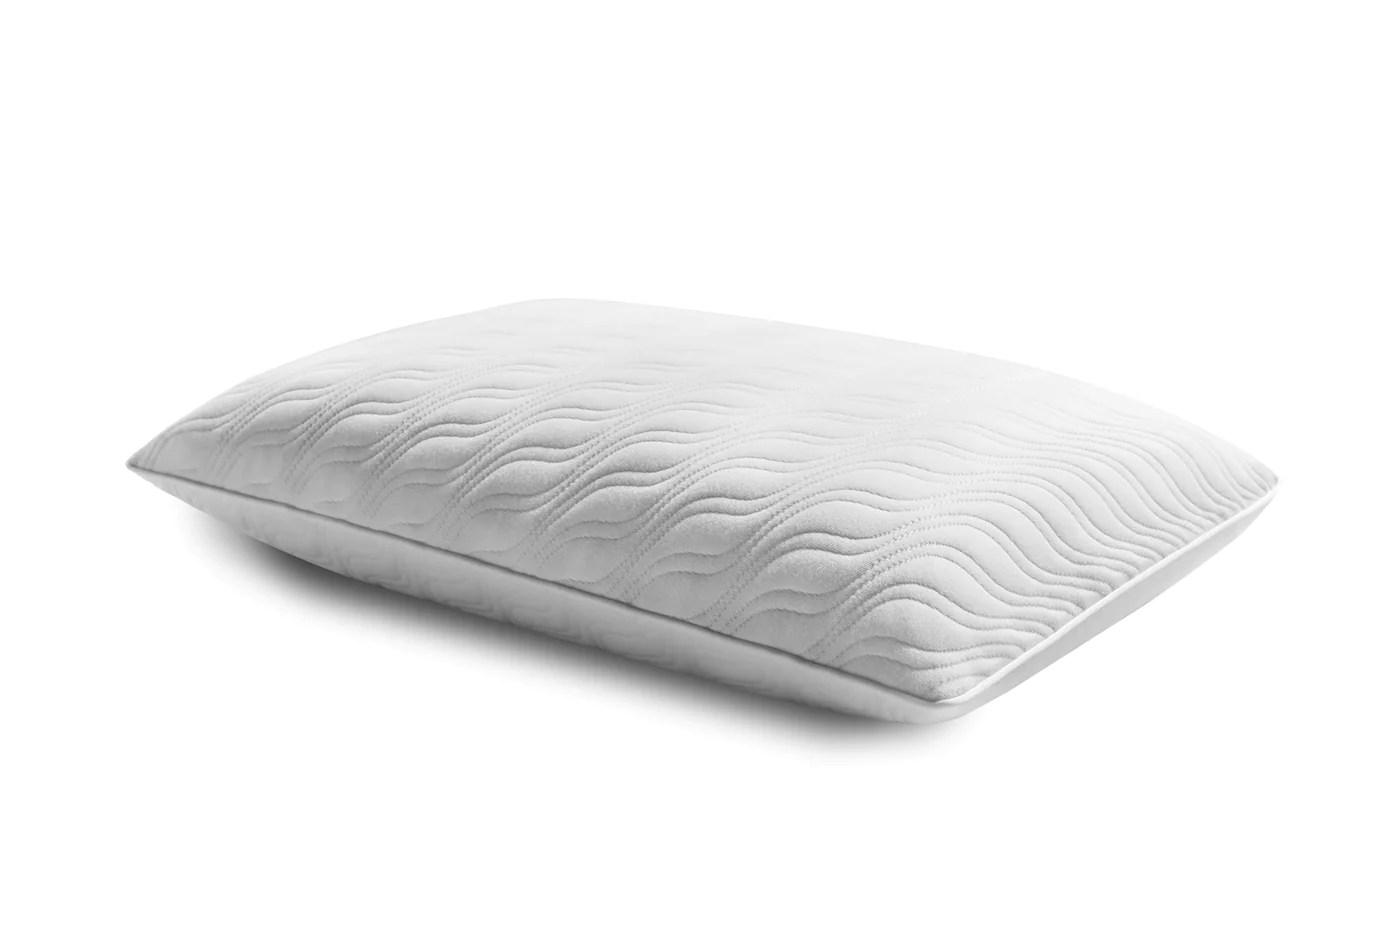 tempur pedic tempur align promid pillow